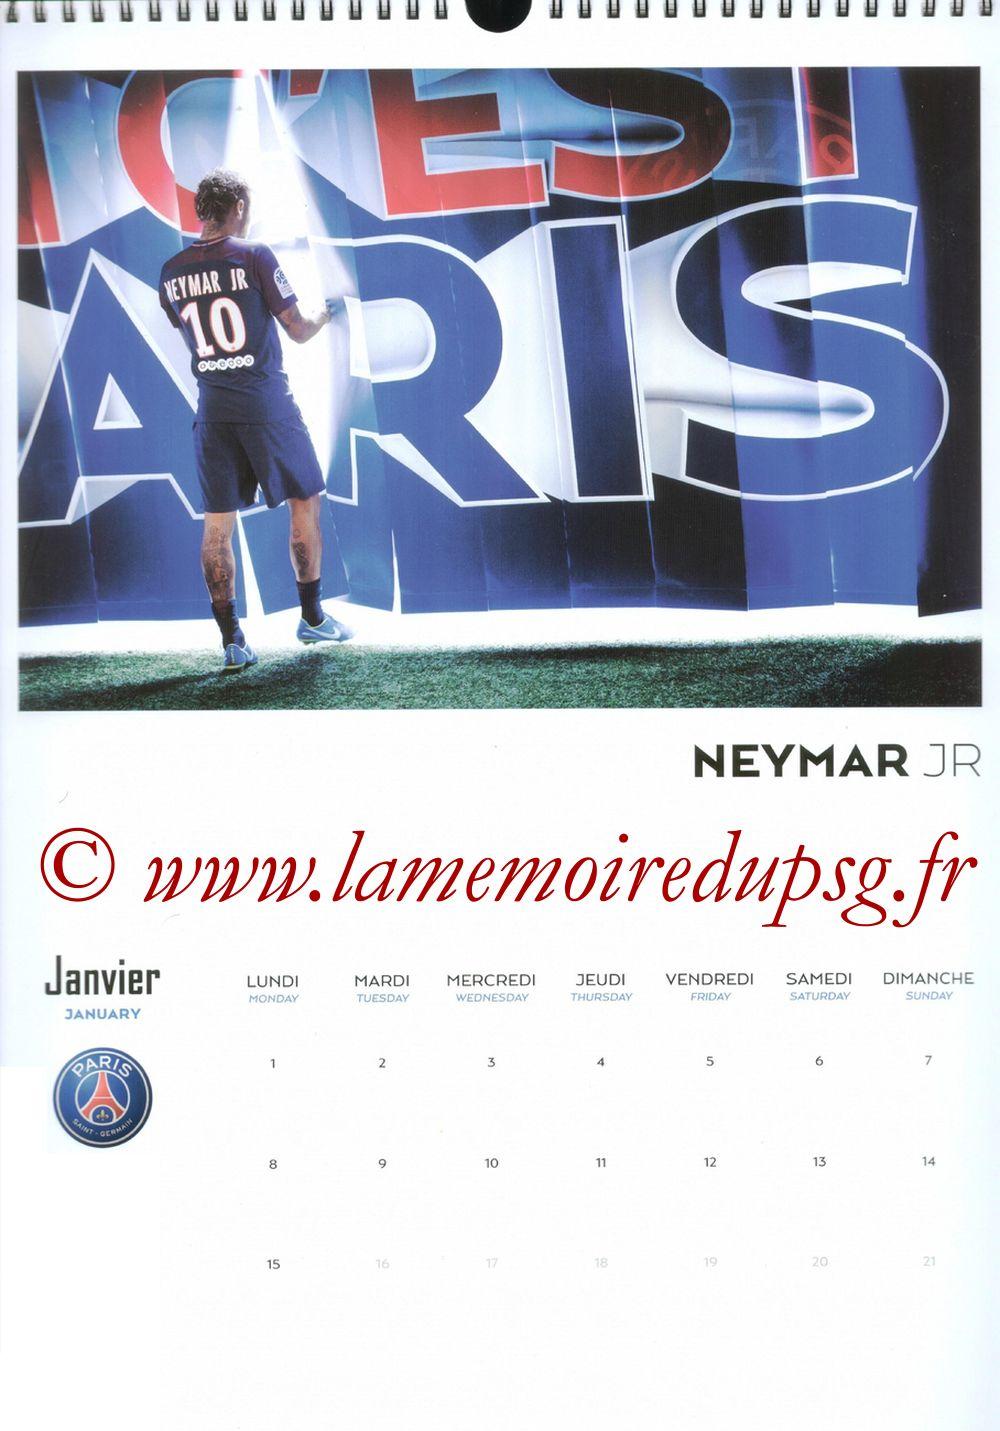 Calendrier PSG 2018 - Page 01 - NEYMAR Jr.